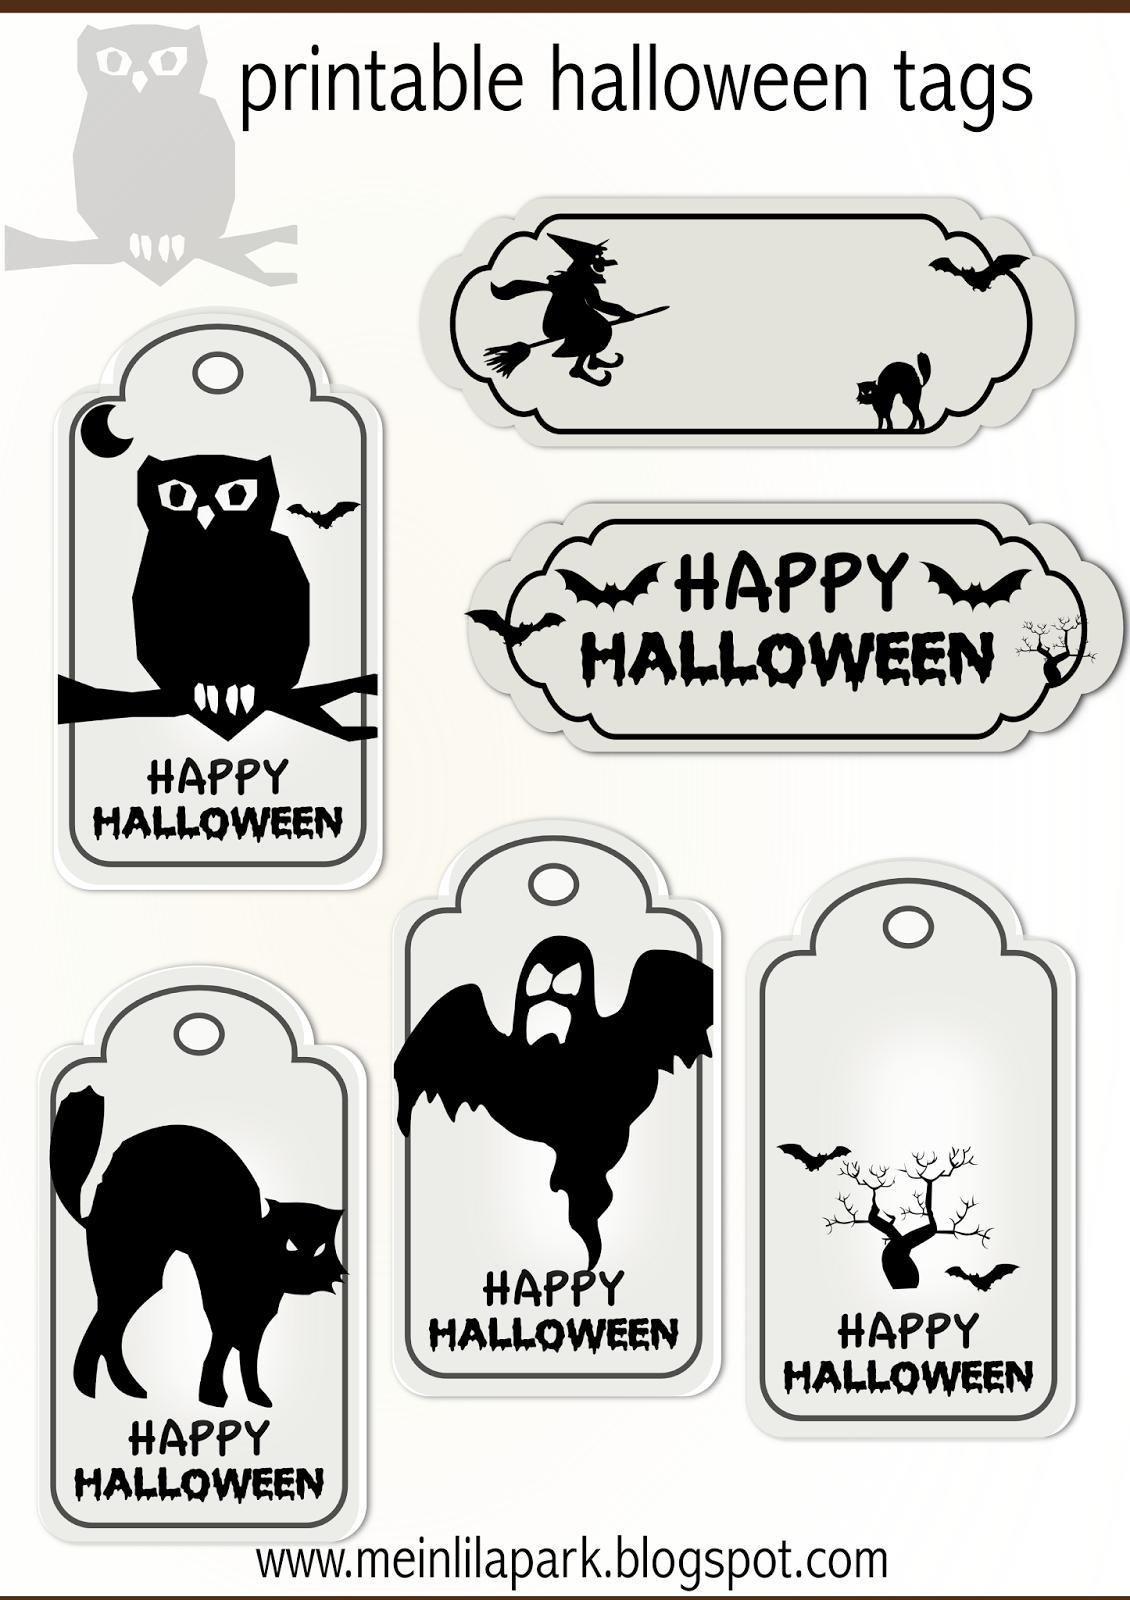 Free Printable Halloween Tags - Druckvorlage Halloween - Freebie - Free Printable Halloween Labels For Treat Bags